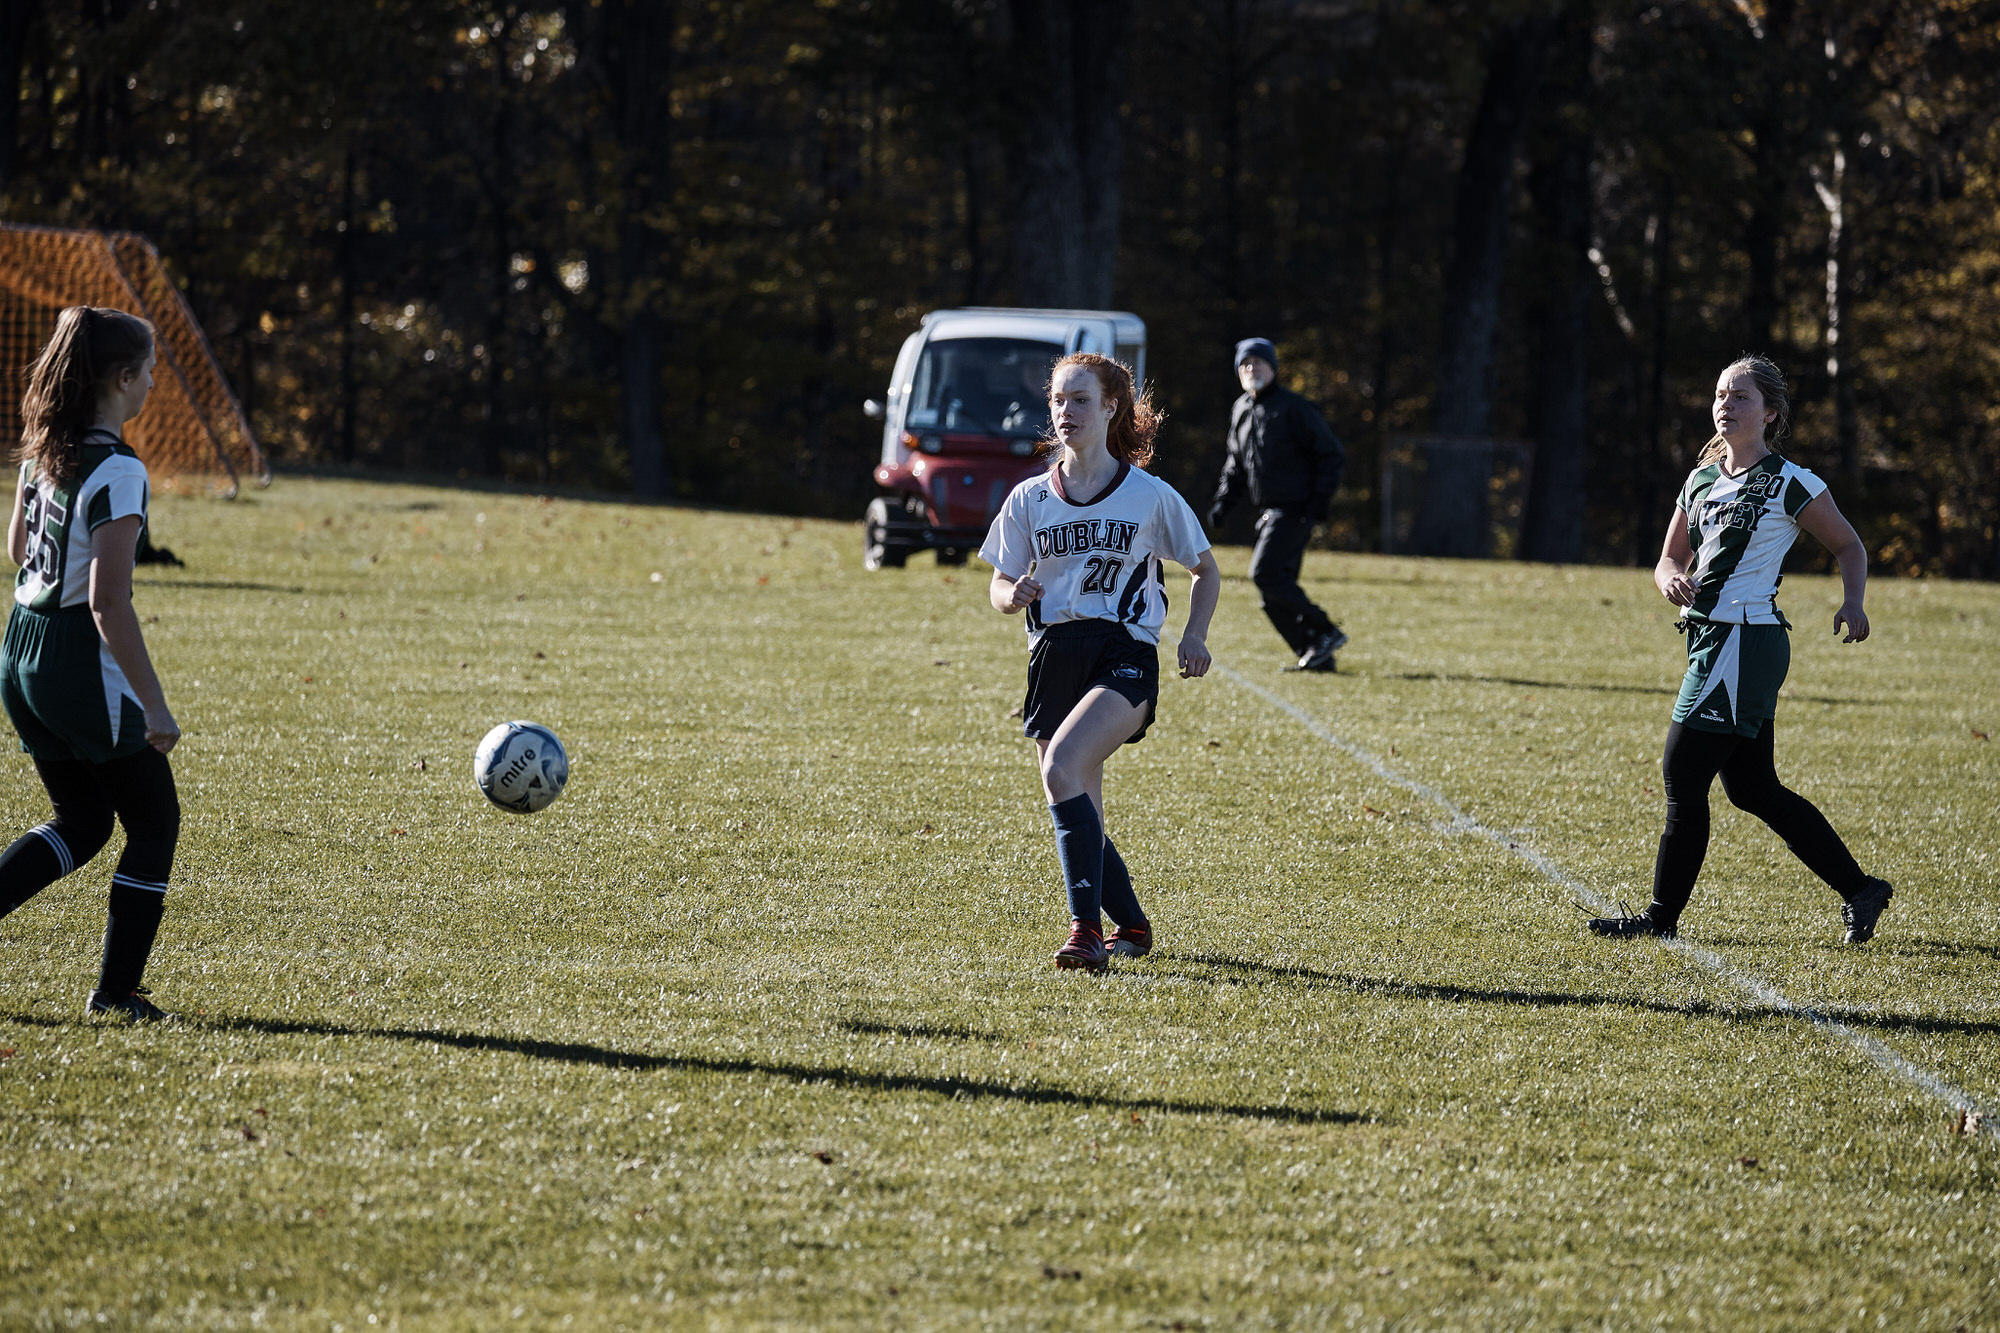 Girls Varsity Soccer vs. Putney School - October 26, 2018 - 010.jpg